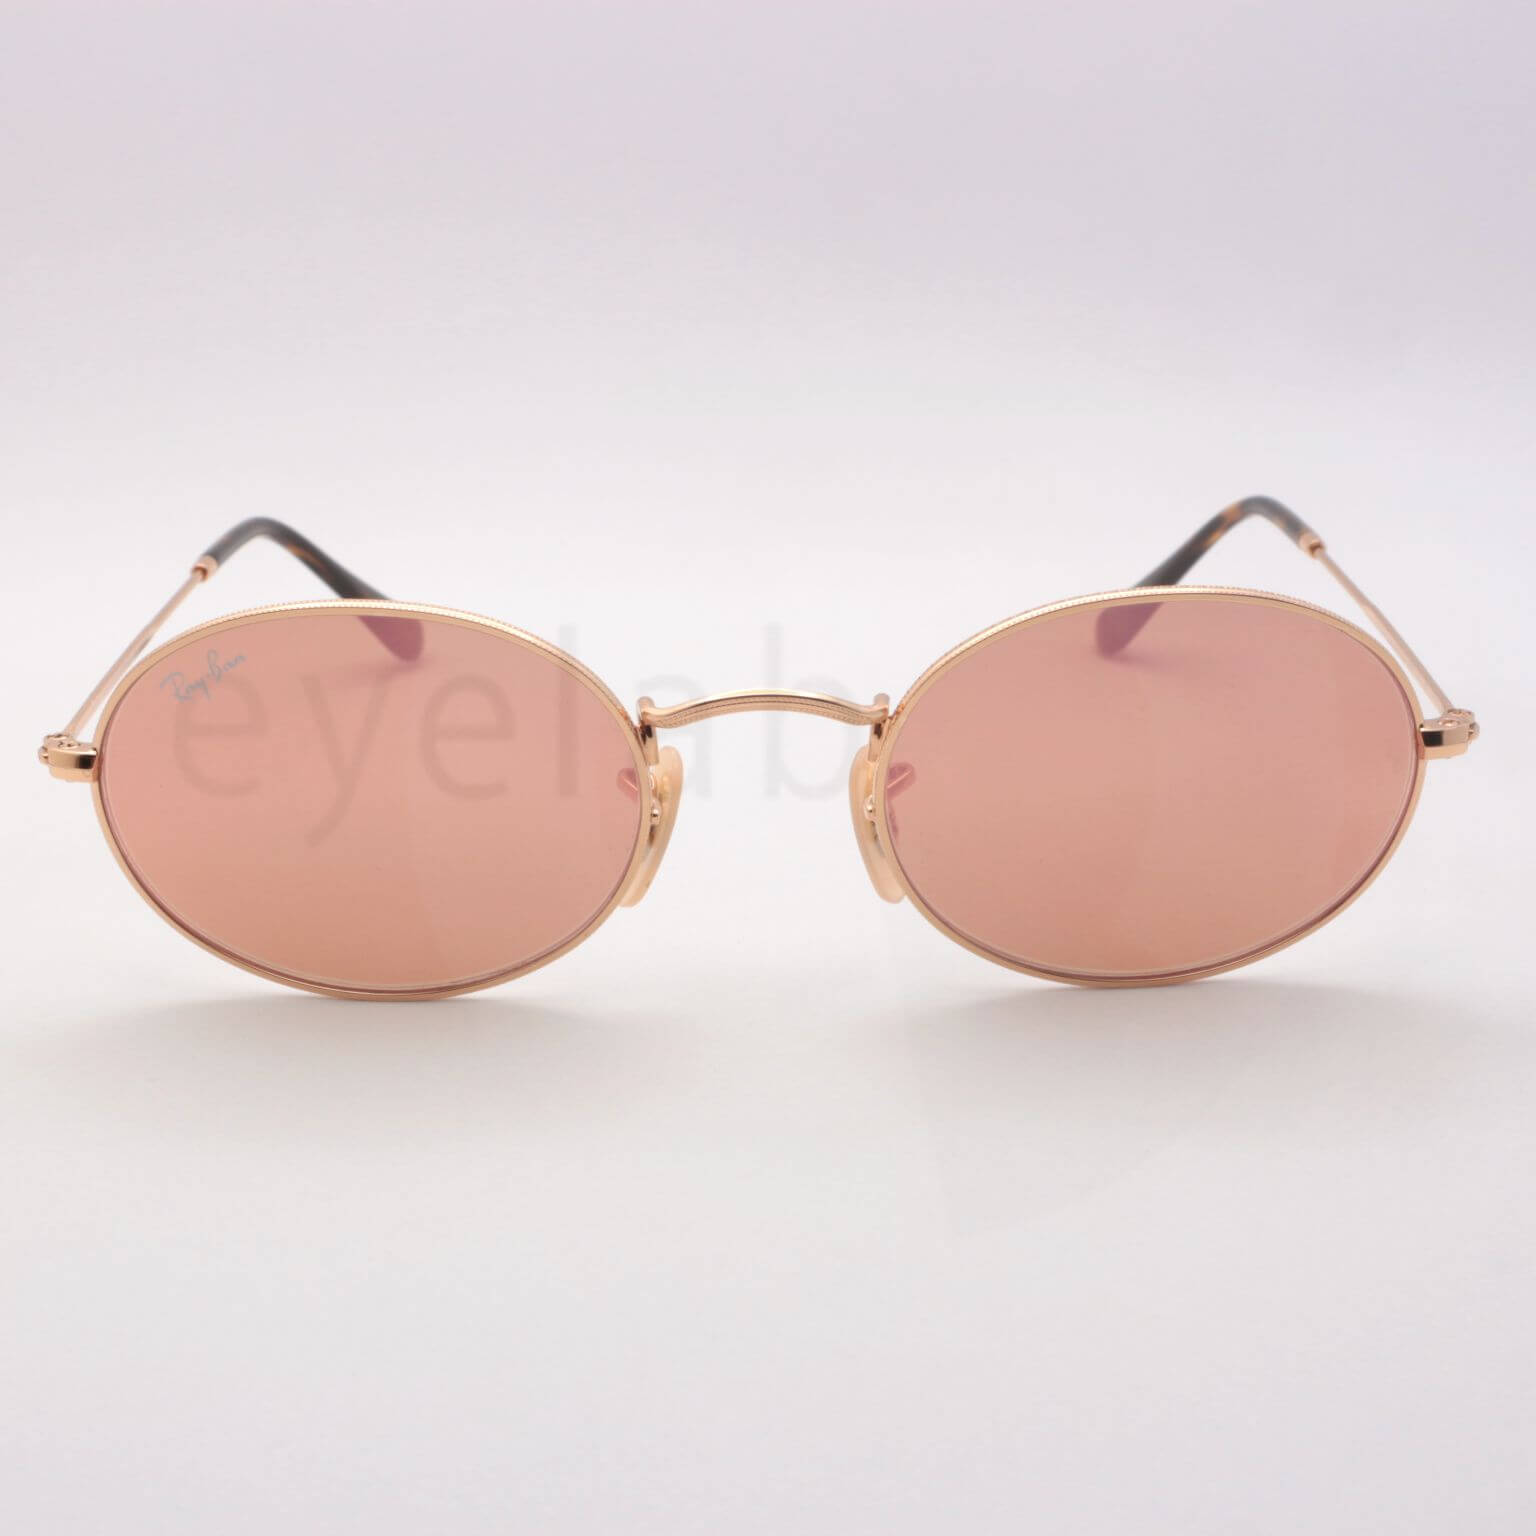 e3f391c22d Γυαλιά ηλίου Ray-Ban Oval Flat 3547N 001Z2 ~ Eyelab